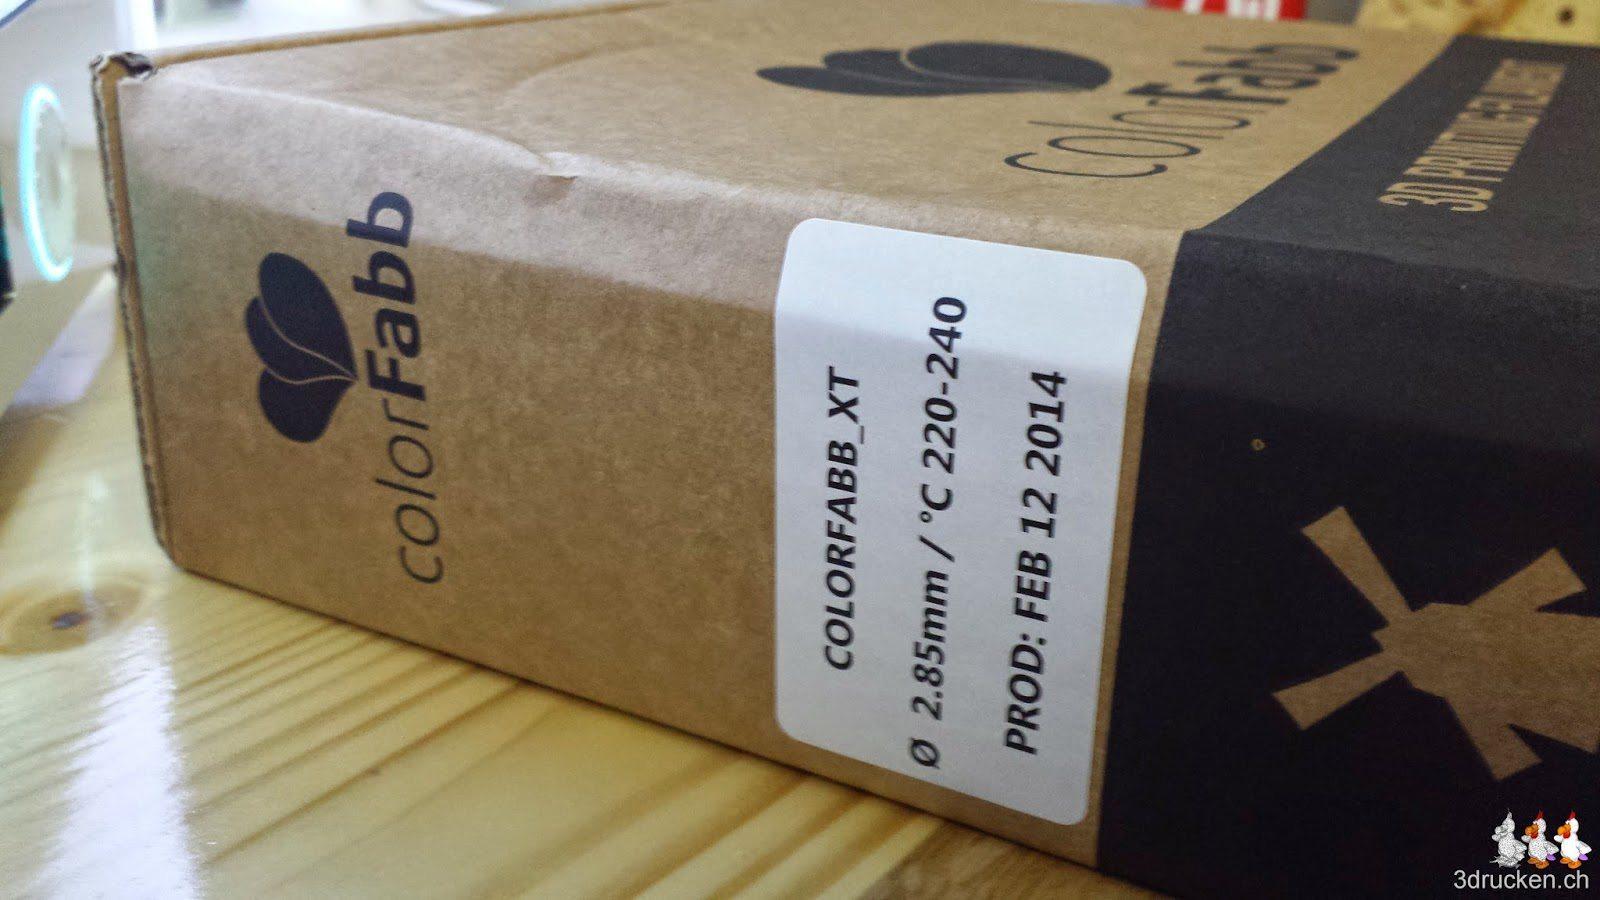 Foto der Verpackung mit dem colorFabb XT Druckmaterial